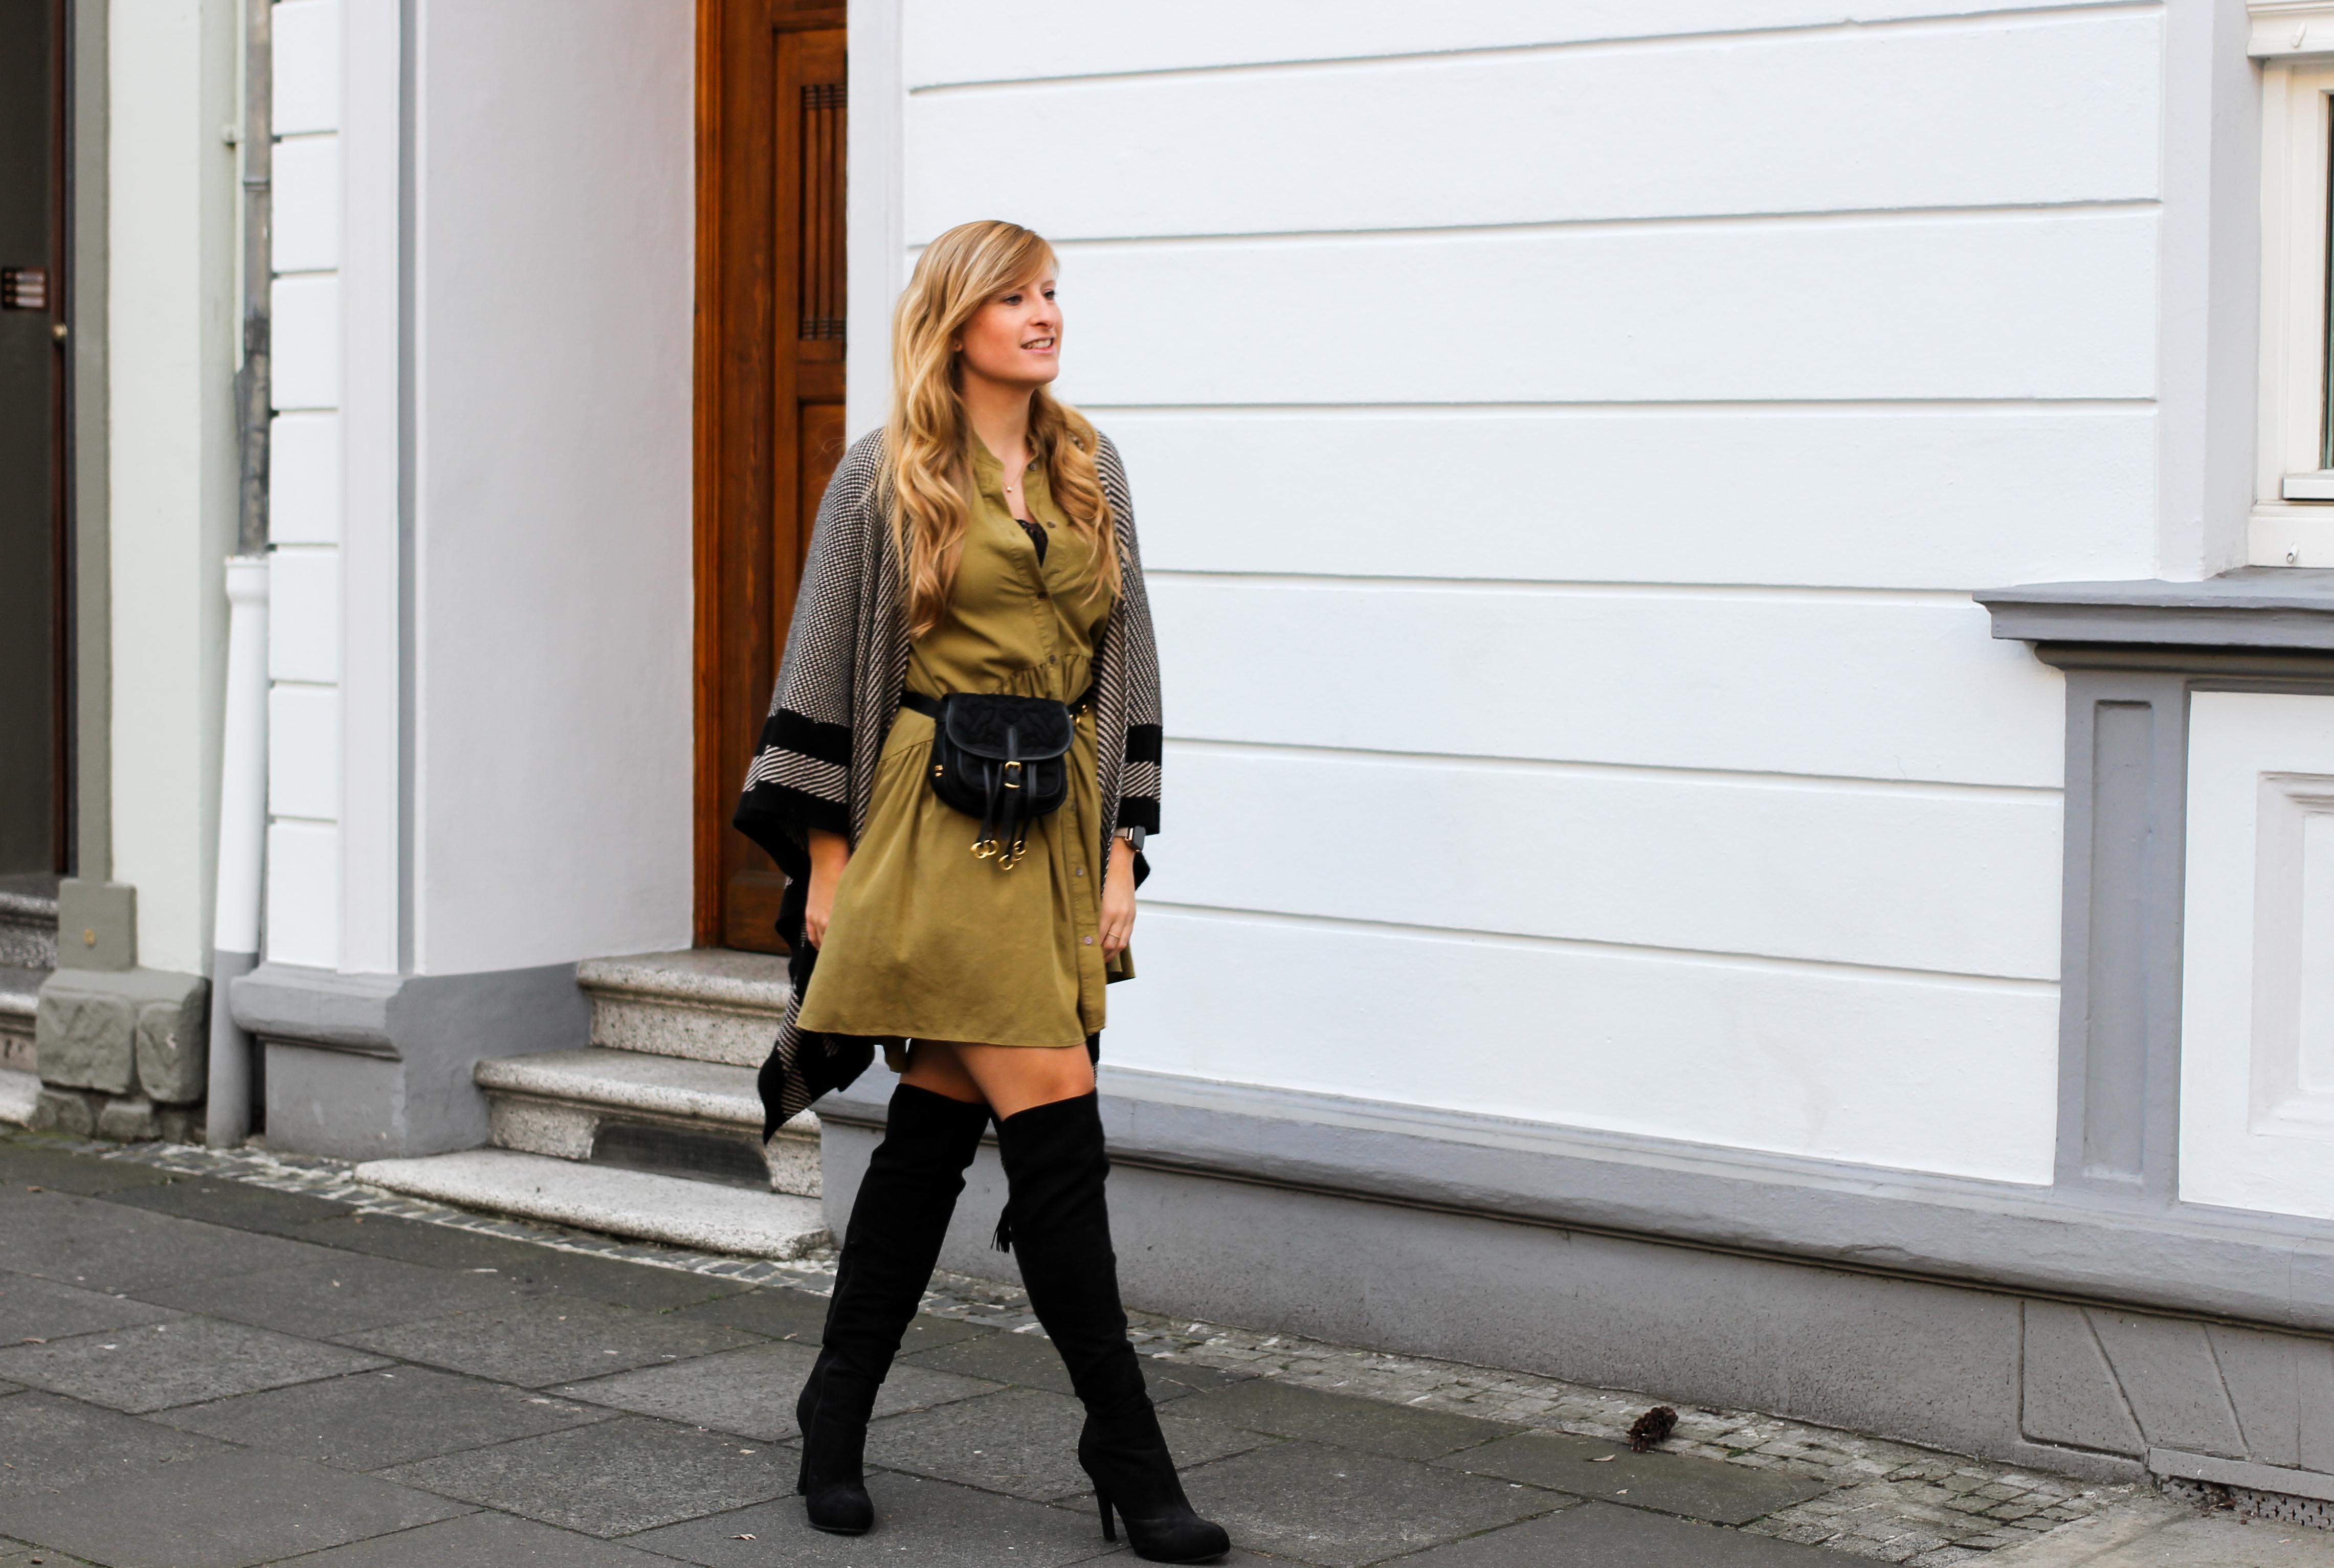 Overknees Gürteltasche Prada Poncho Second-Hand Kleidung kombinieren Streetstyle Outfit Bonn Zara Kleid grün Frühling 2019 5